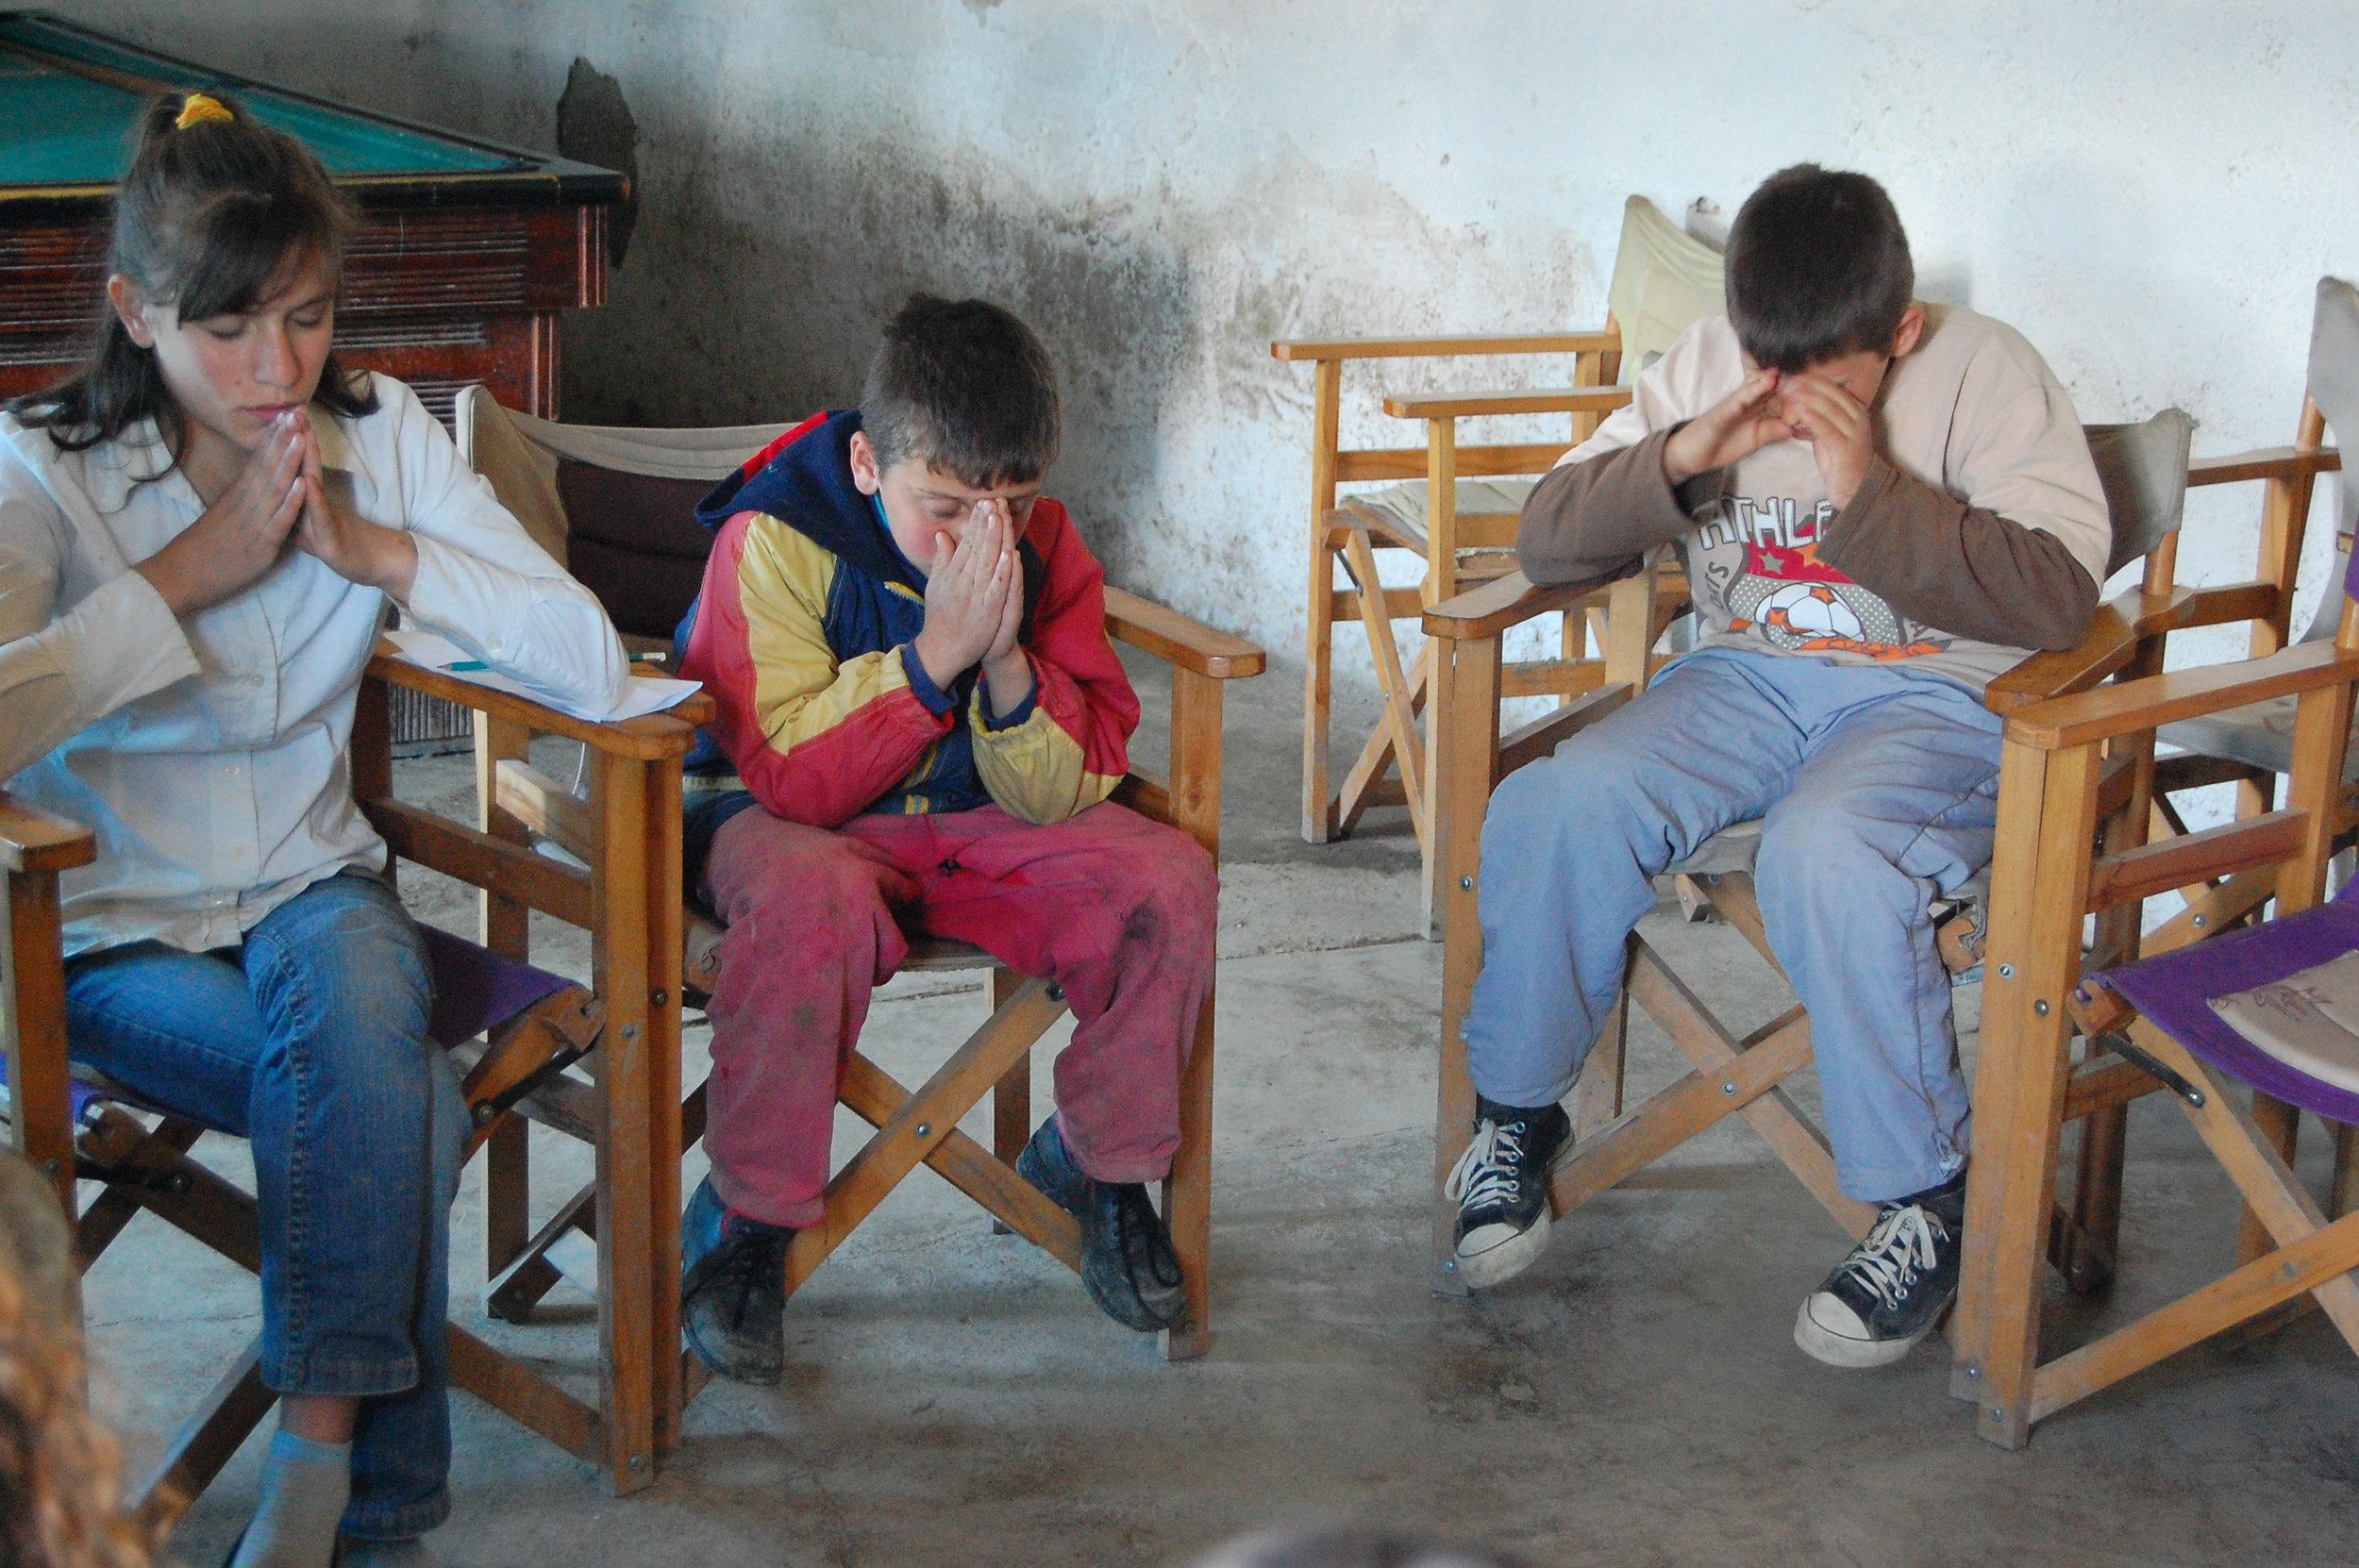 PW_090508_Albania_293.jpg